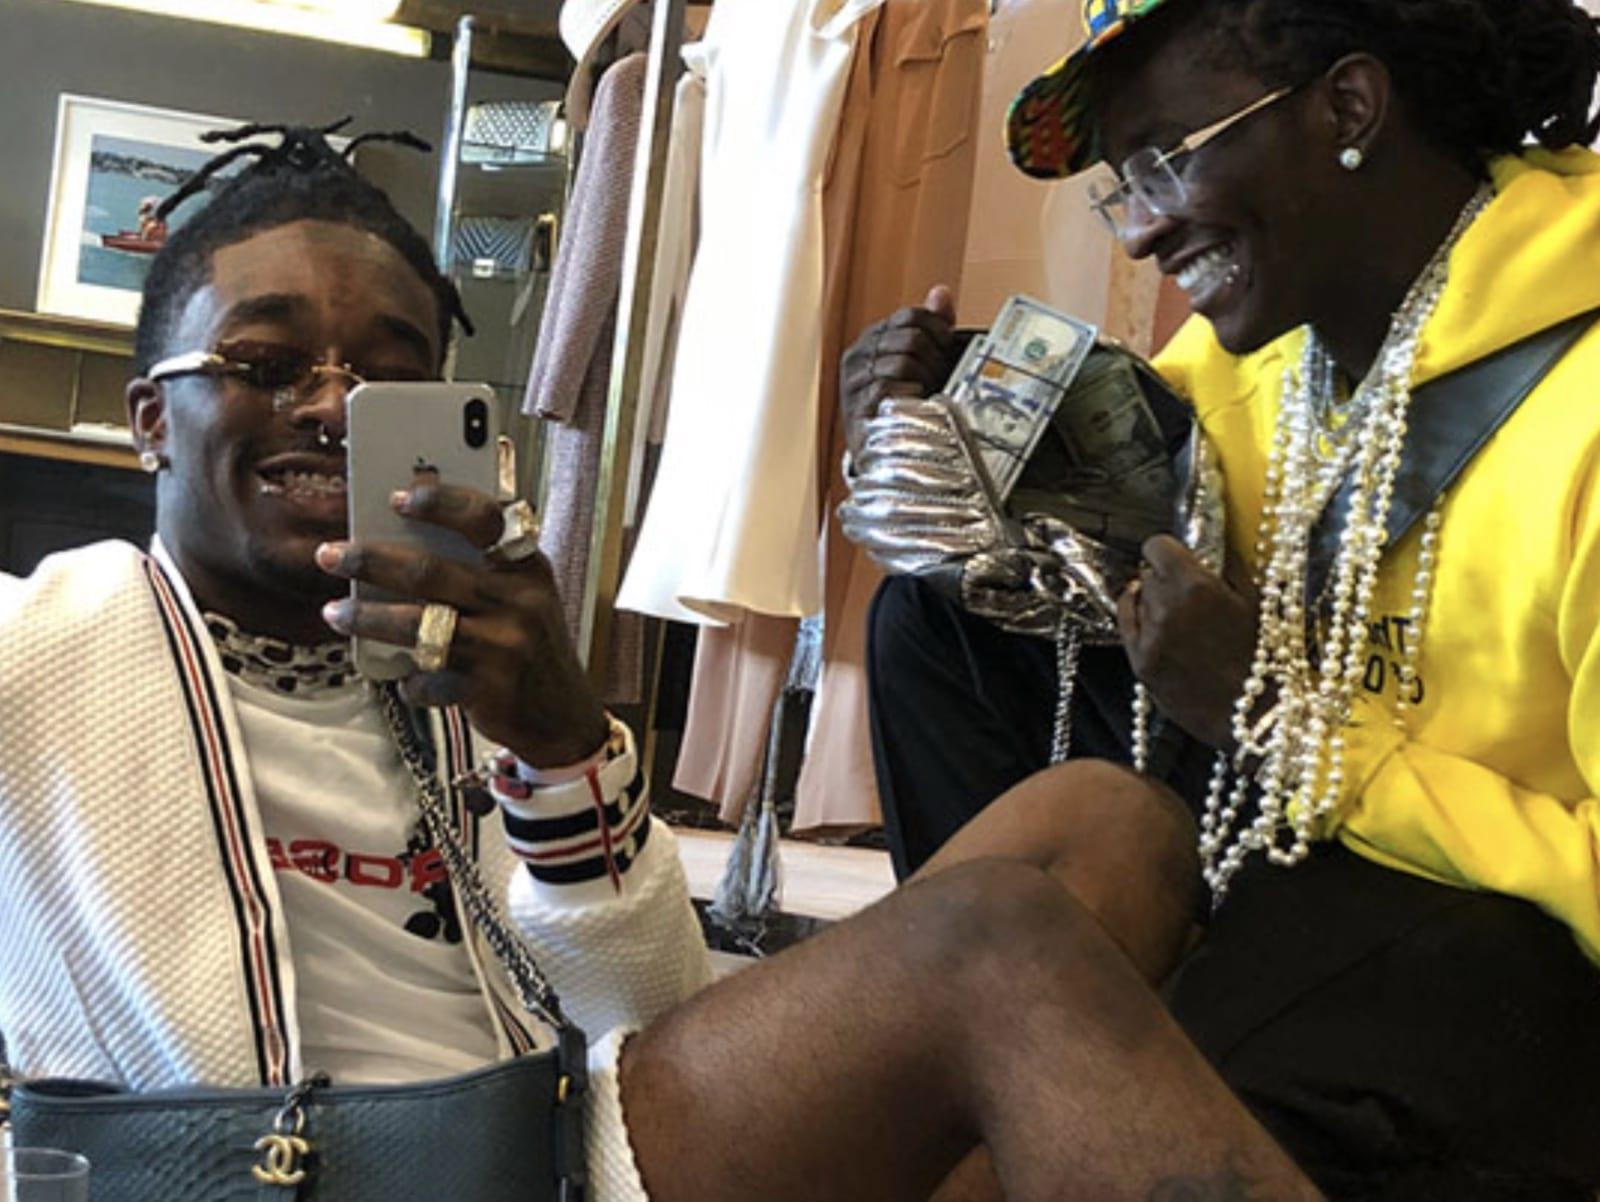 Lil Uzi Vert Young Thug Selfie Together